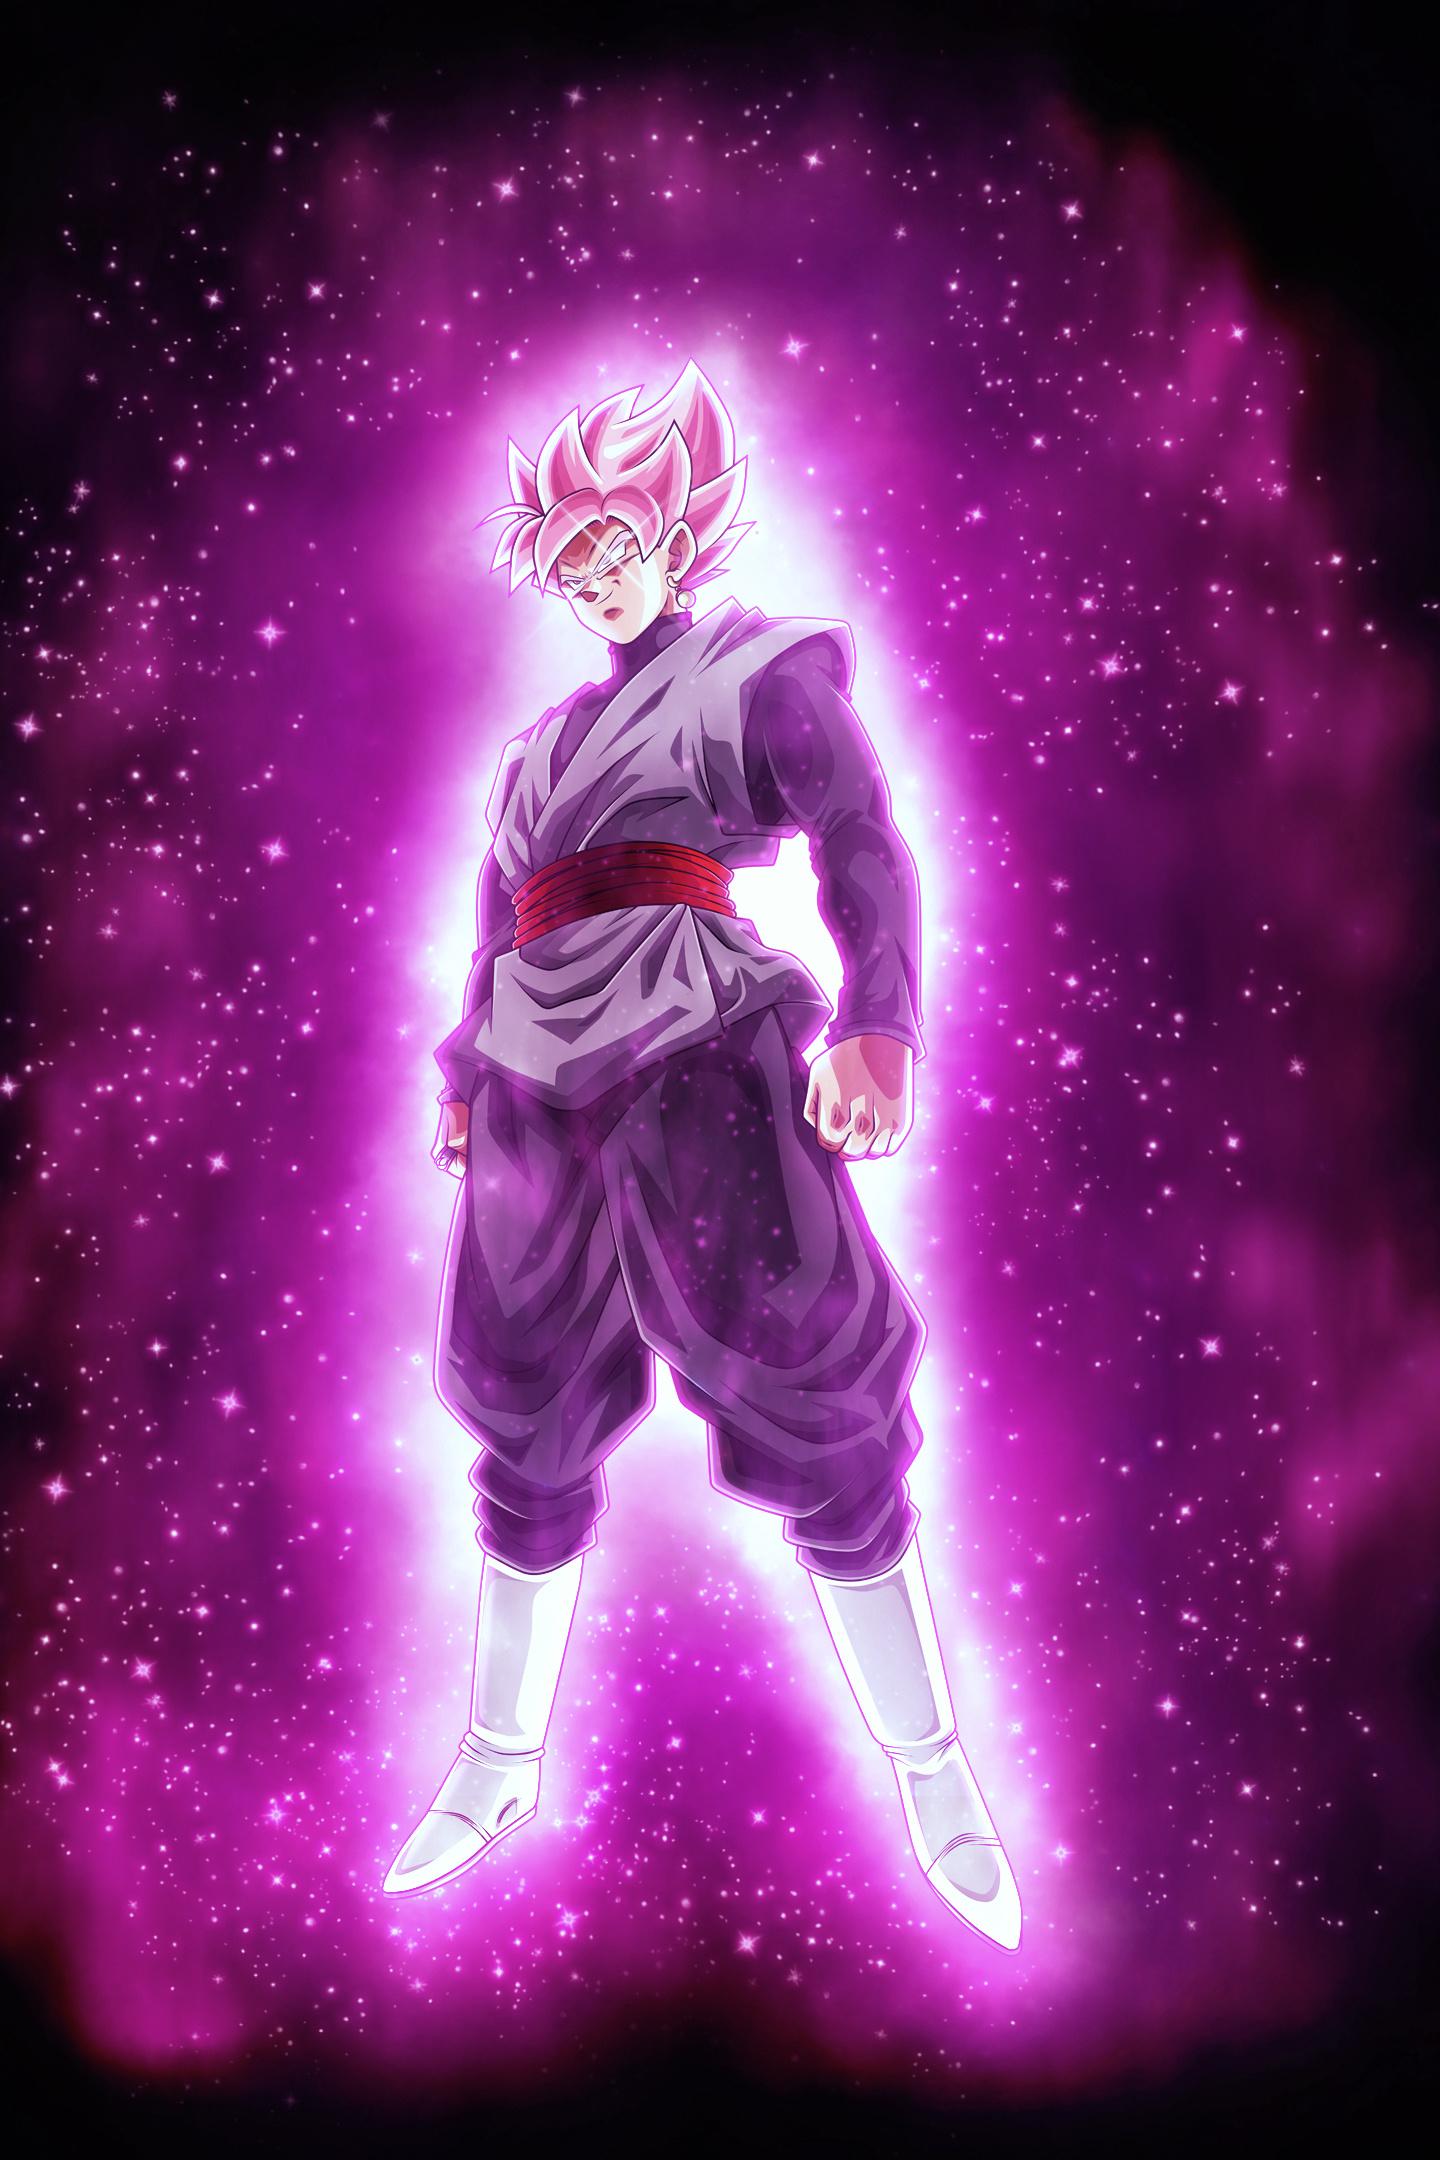 Download 1440x2960 Wallpaper Black Goku Ultra Instinct